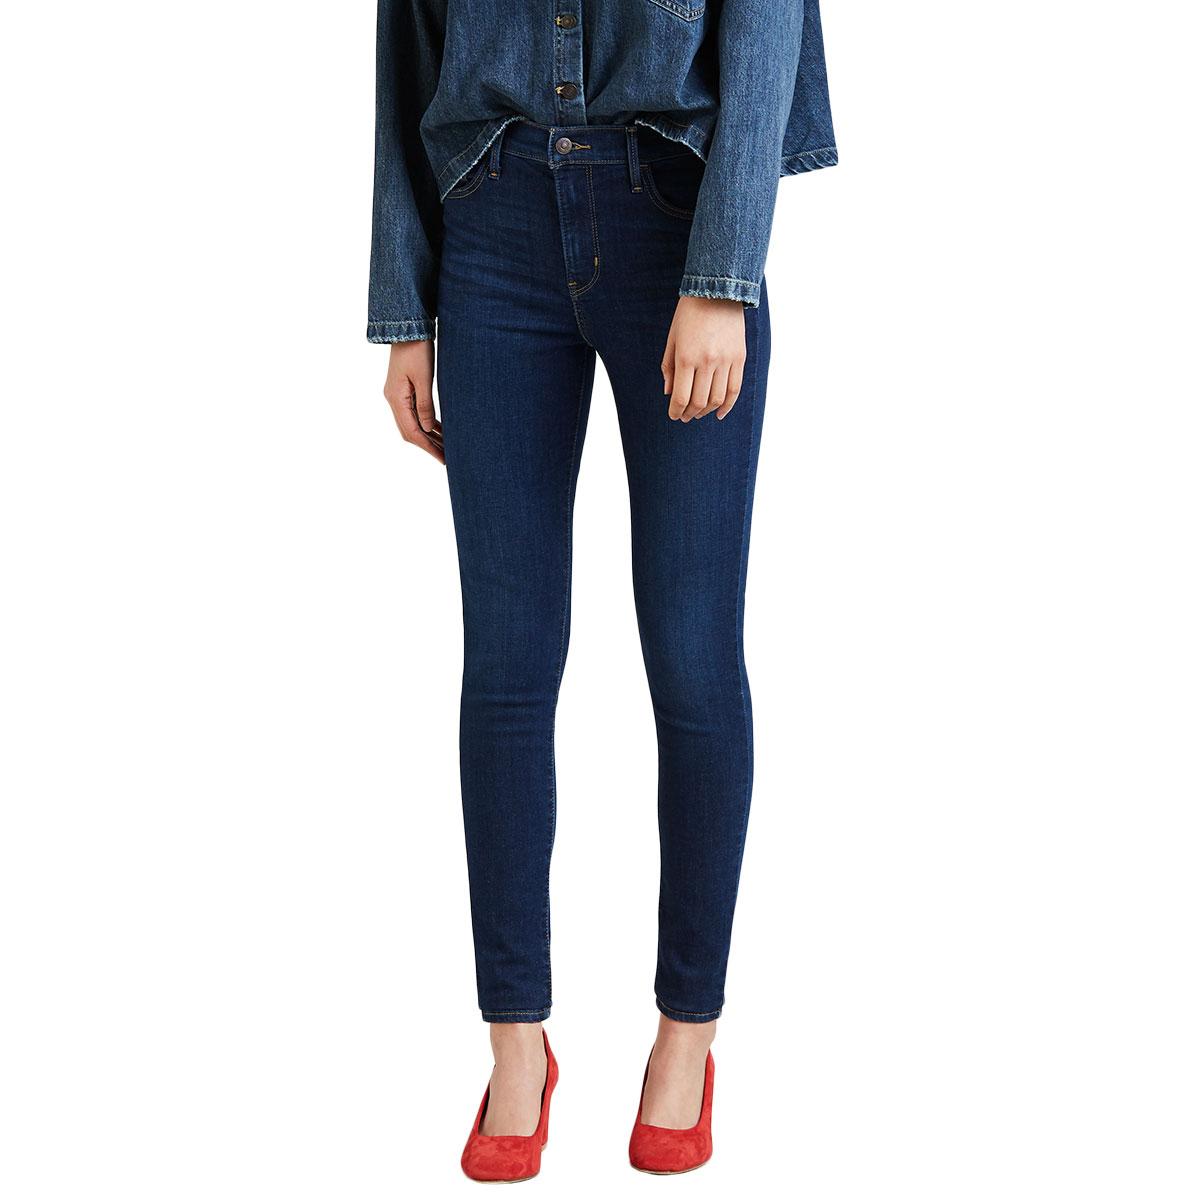 Levi's Women's 720 High Rise Super Skinny Jeans - Blue, 25